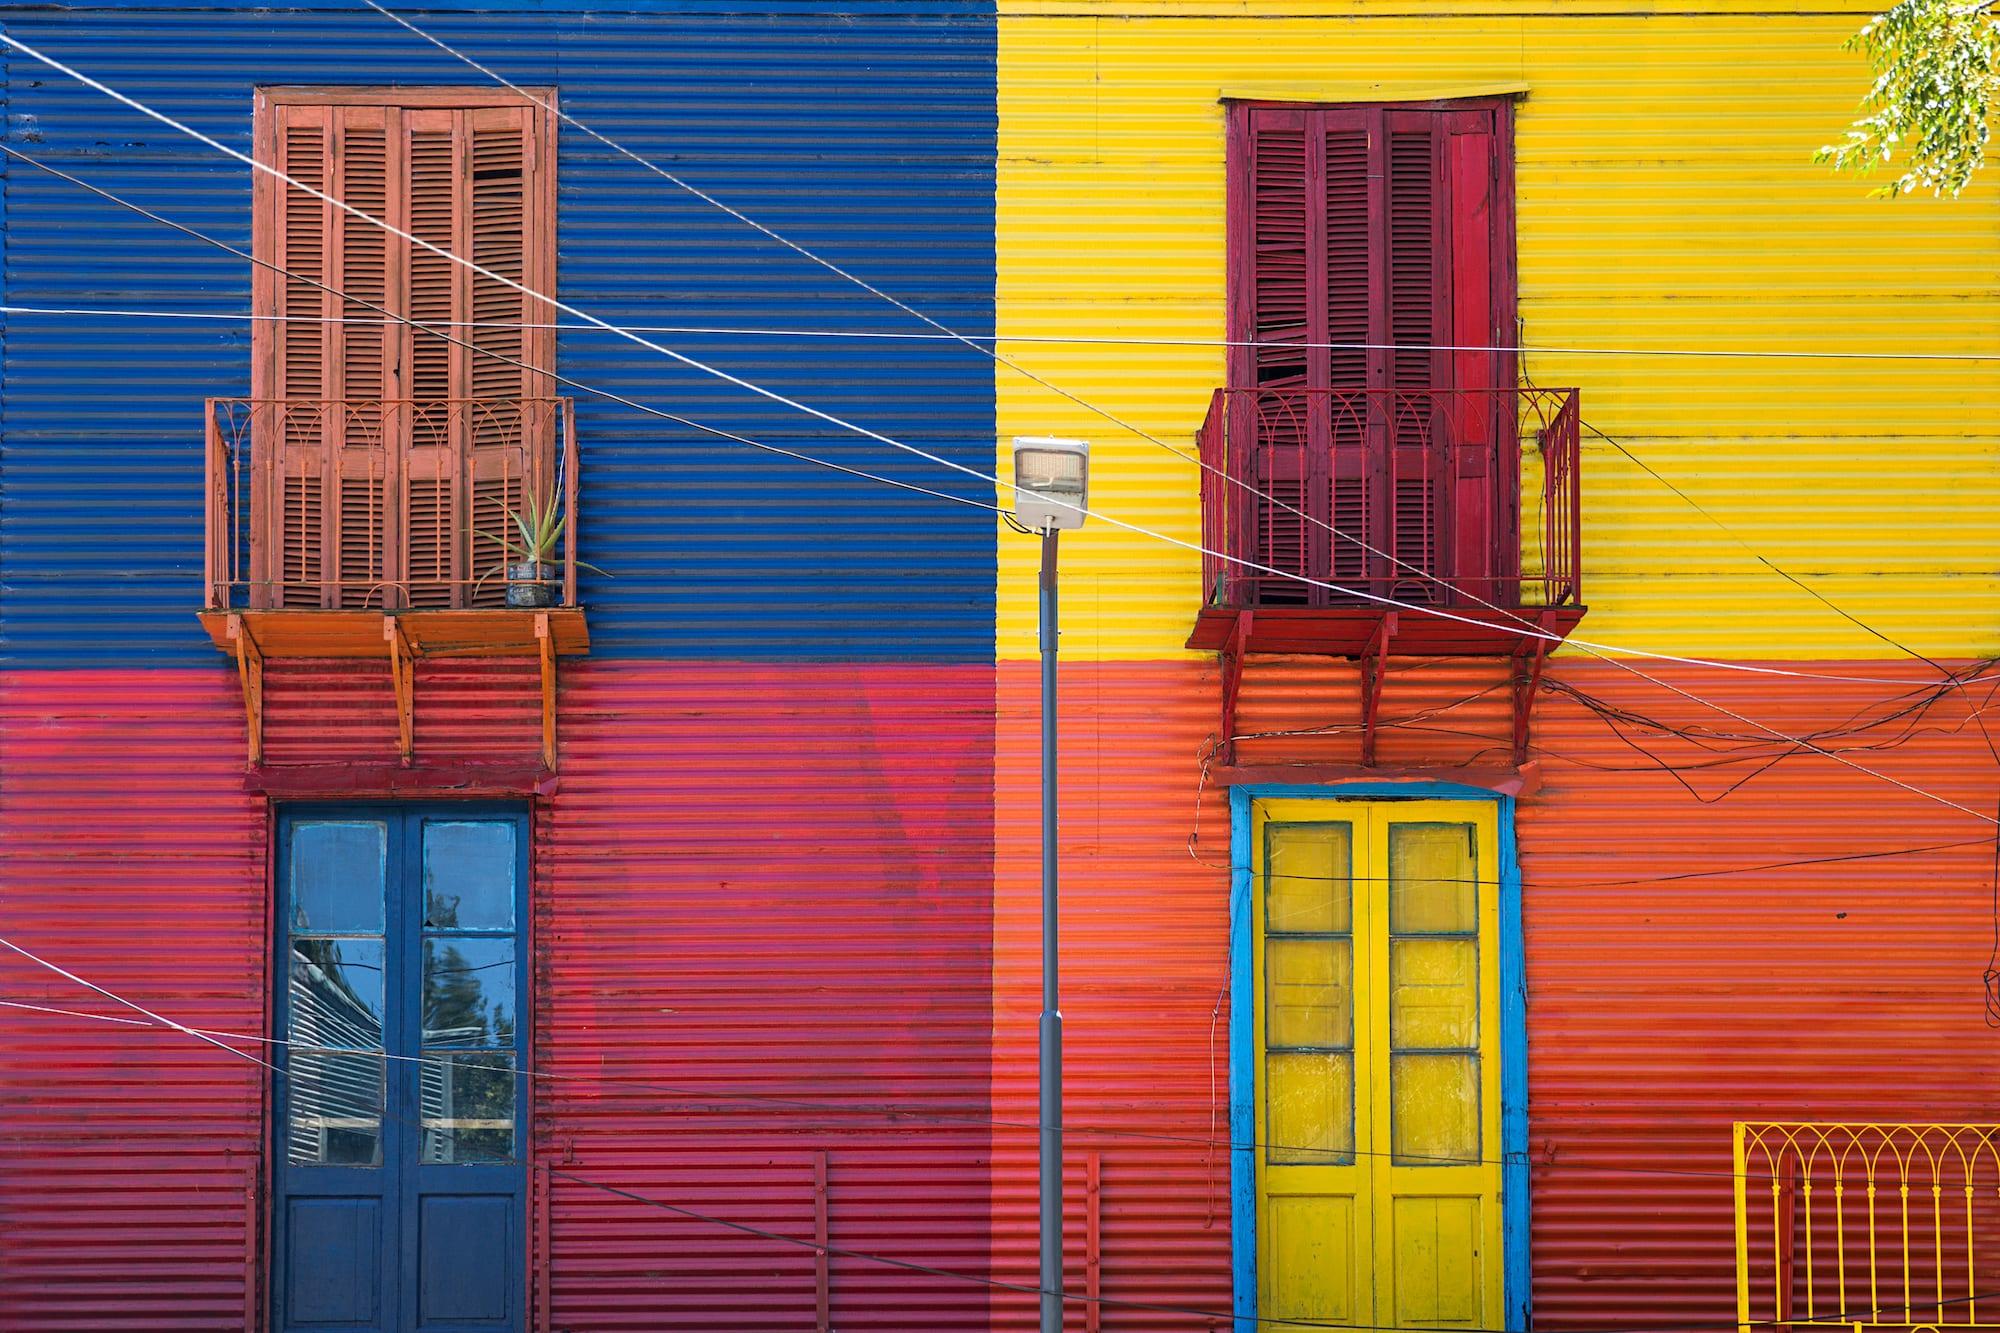 A colorful facade in Caminito in La Boca, Buenos Aires © | Goran Bogicevic/Shutterstock